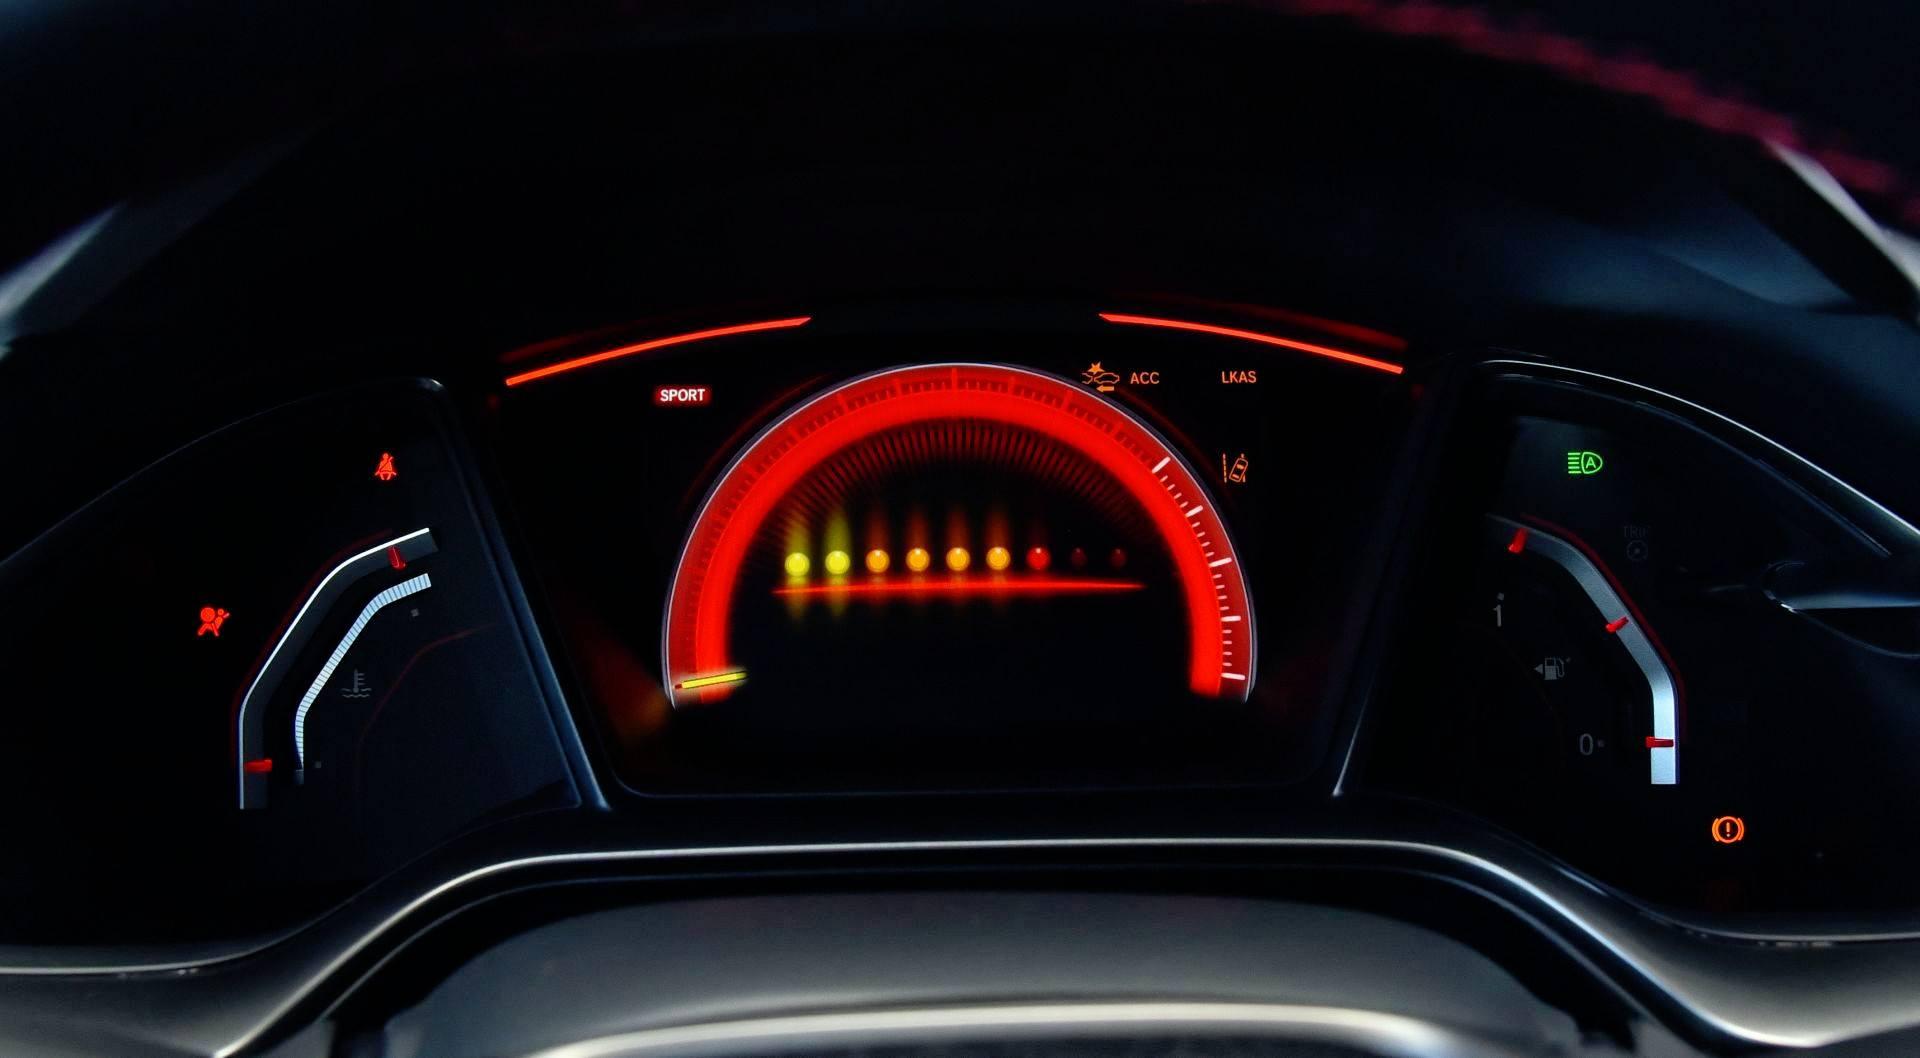 Honda Civic Type R - obrotomierz